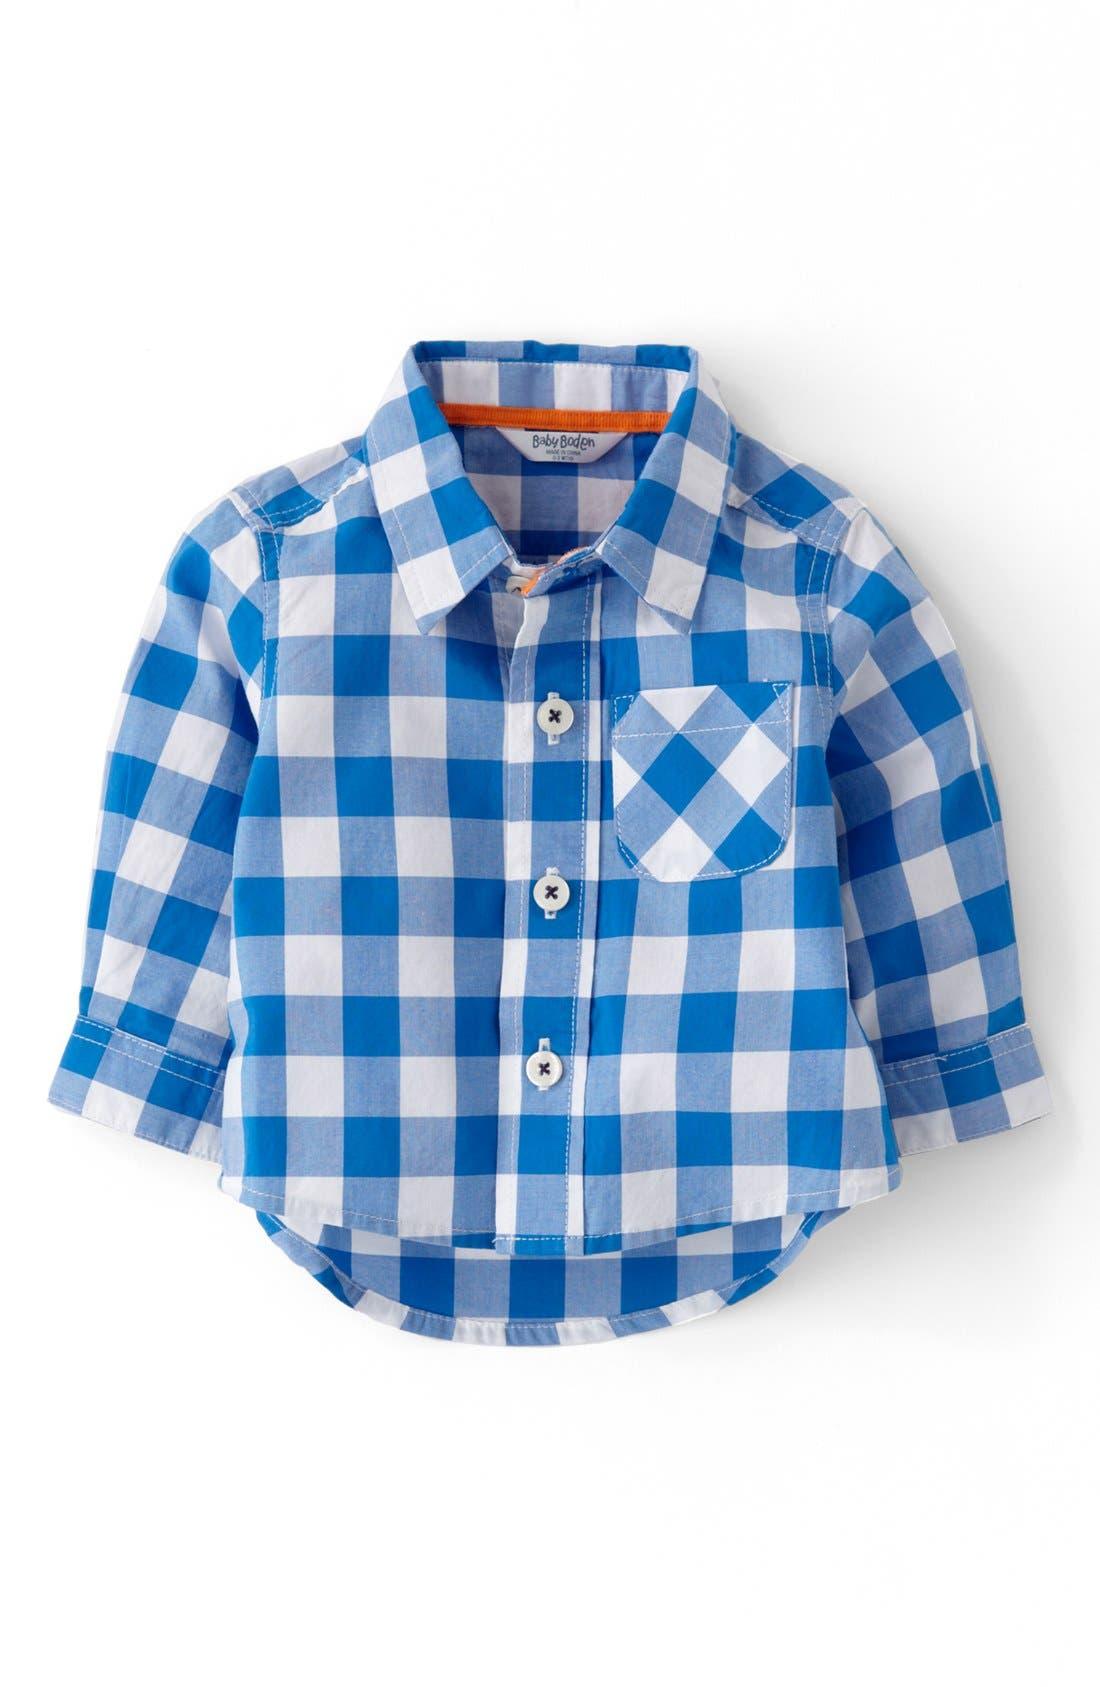 Main Image - Mini Boden 'Laundered' Woven Shirt (Baby Boys)